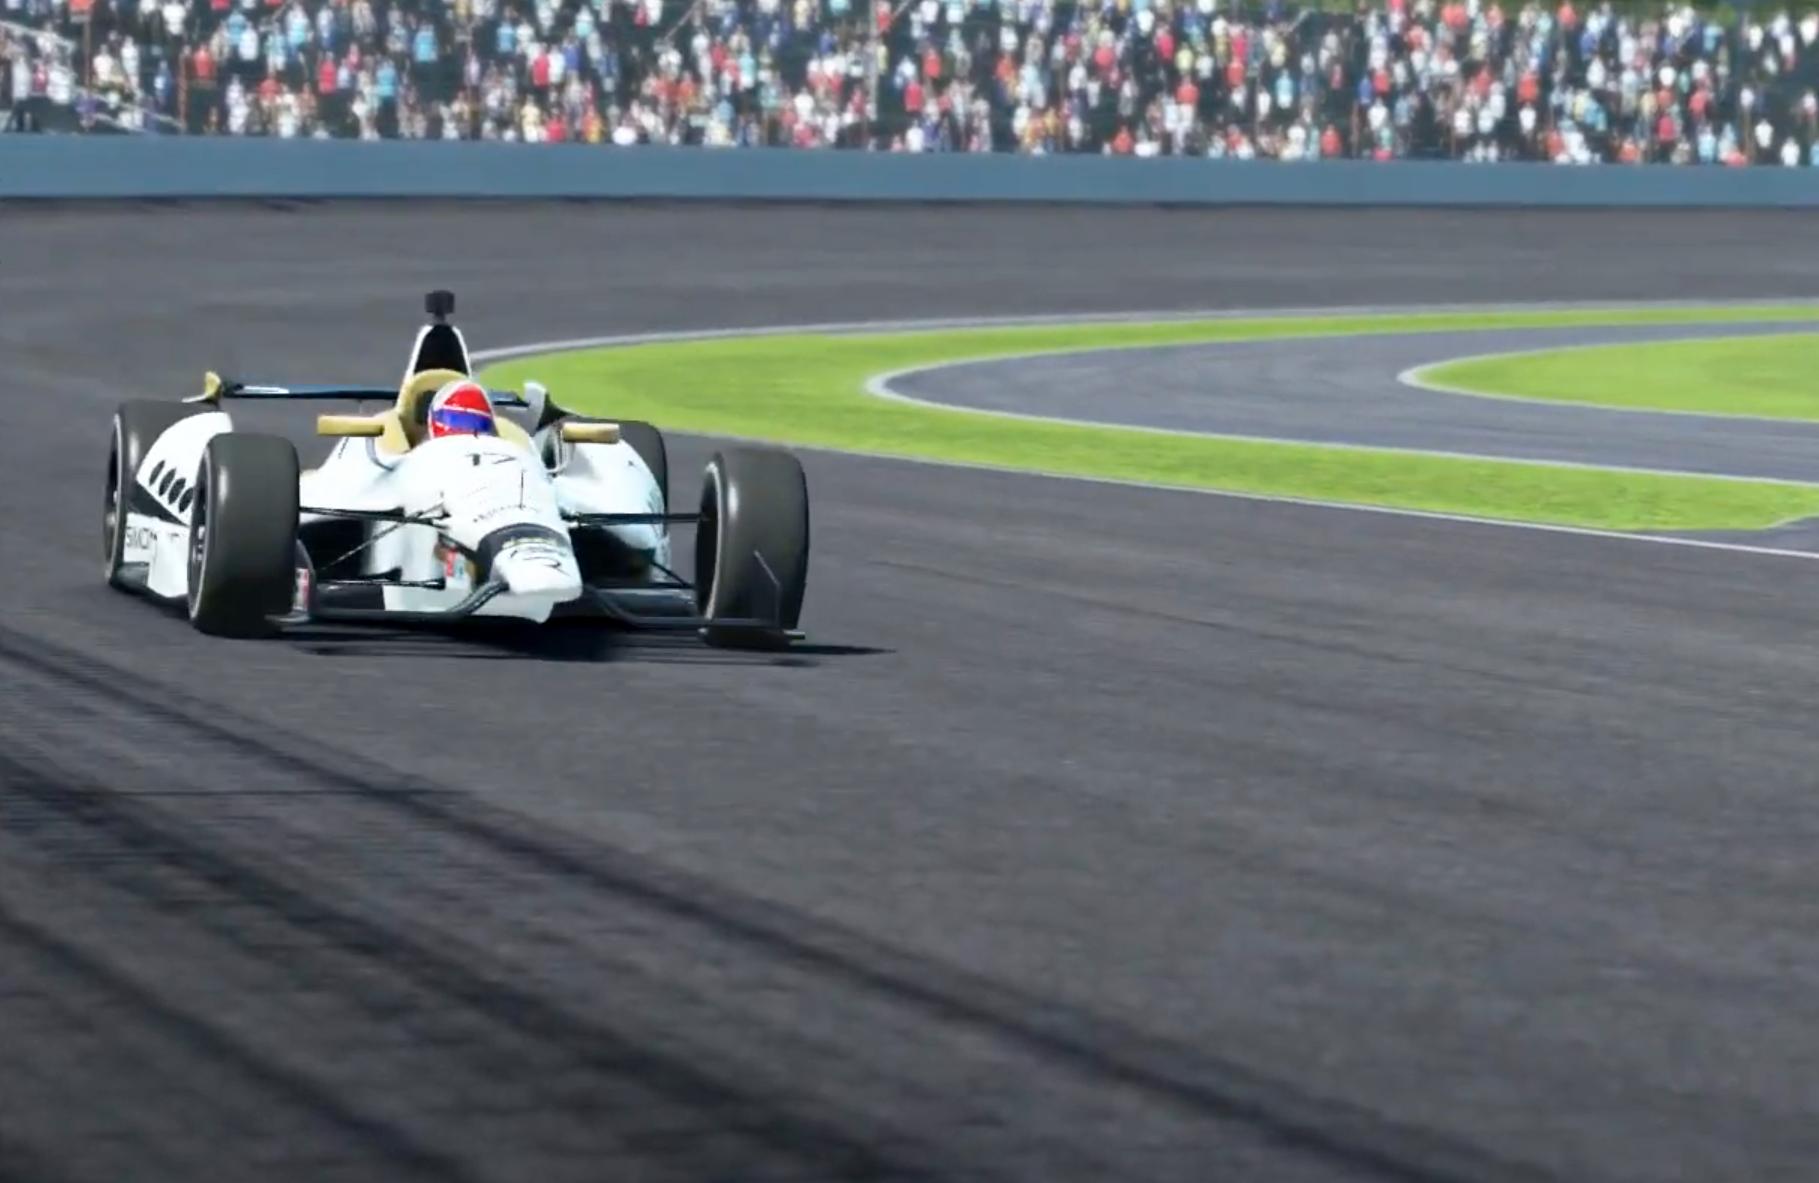 Indypro R6 Simoncic